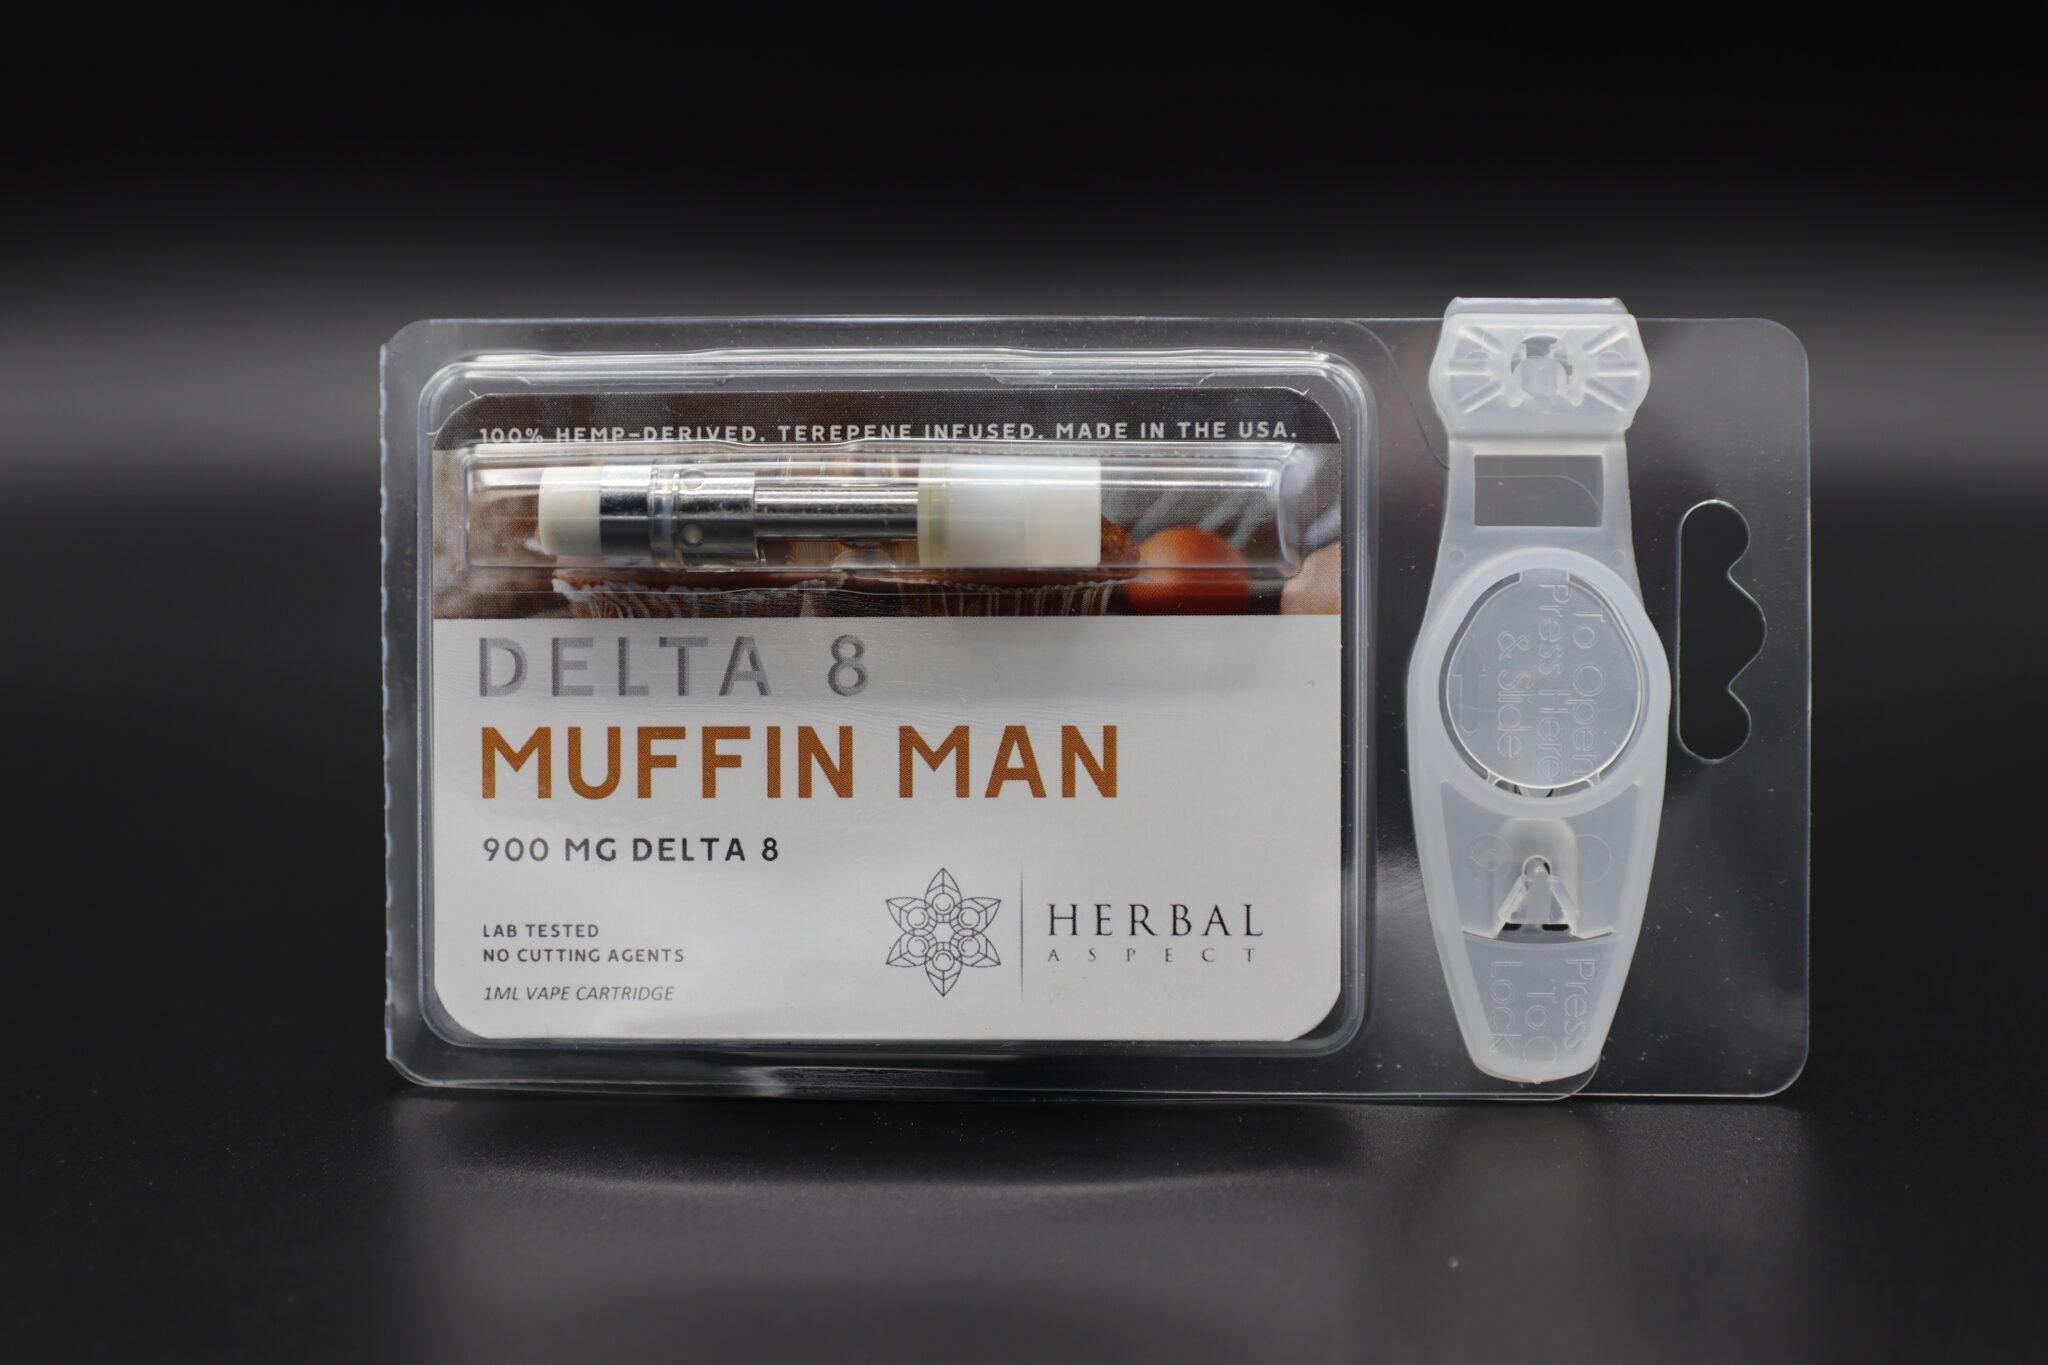 Herbal Aspect Delta 8 Vape - 900 MG - Muffin Man